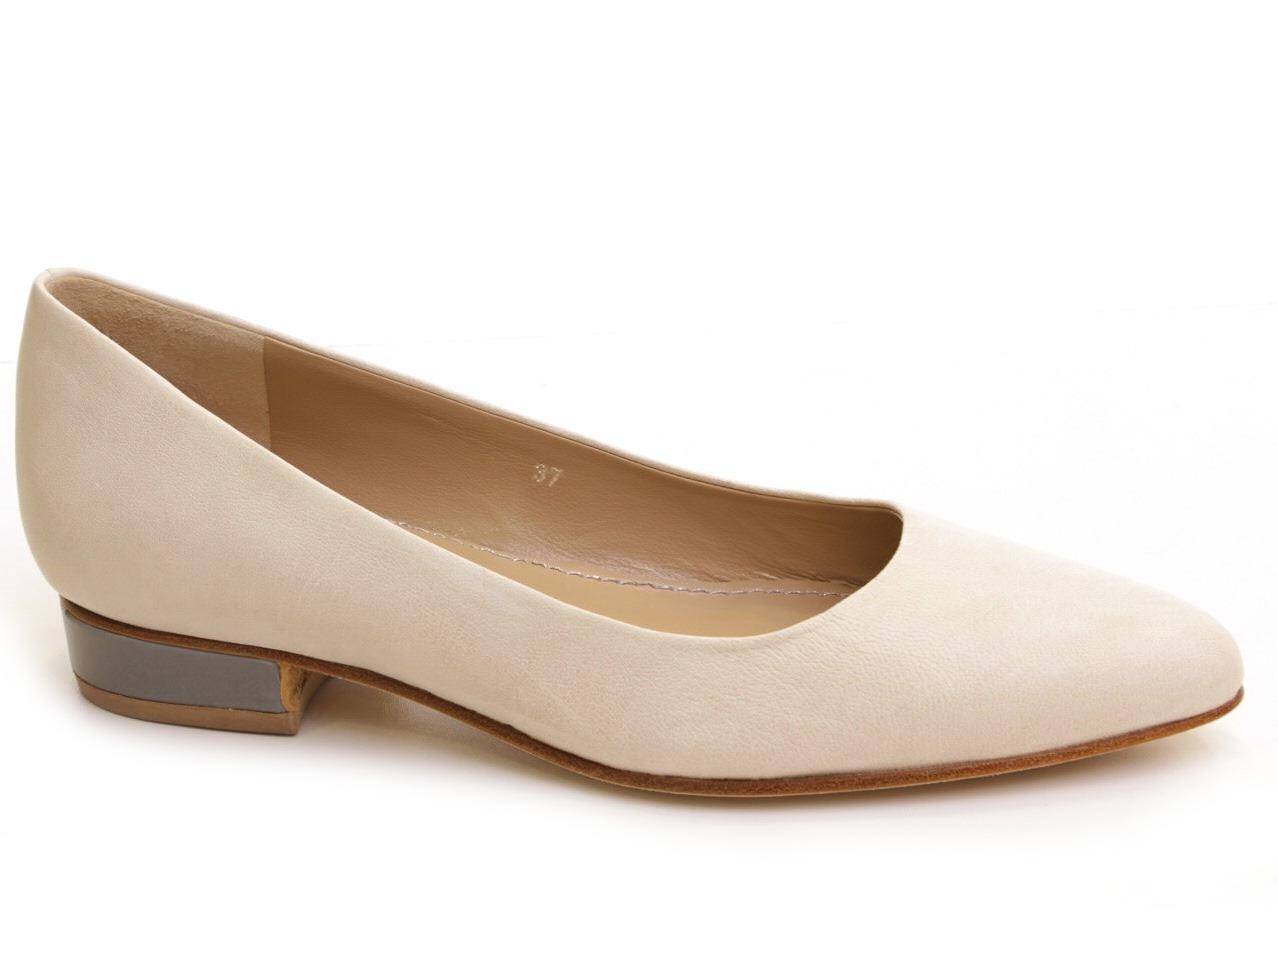 Chaussures Plates, Ballerine, Mocassins Helsar - 032 MARTHA